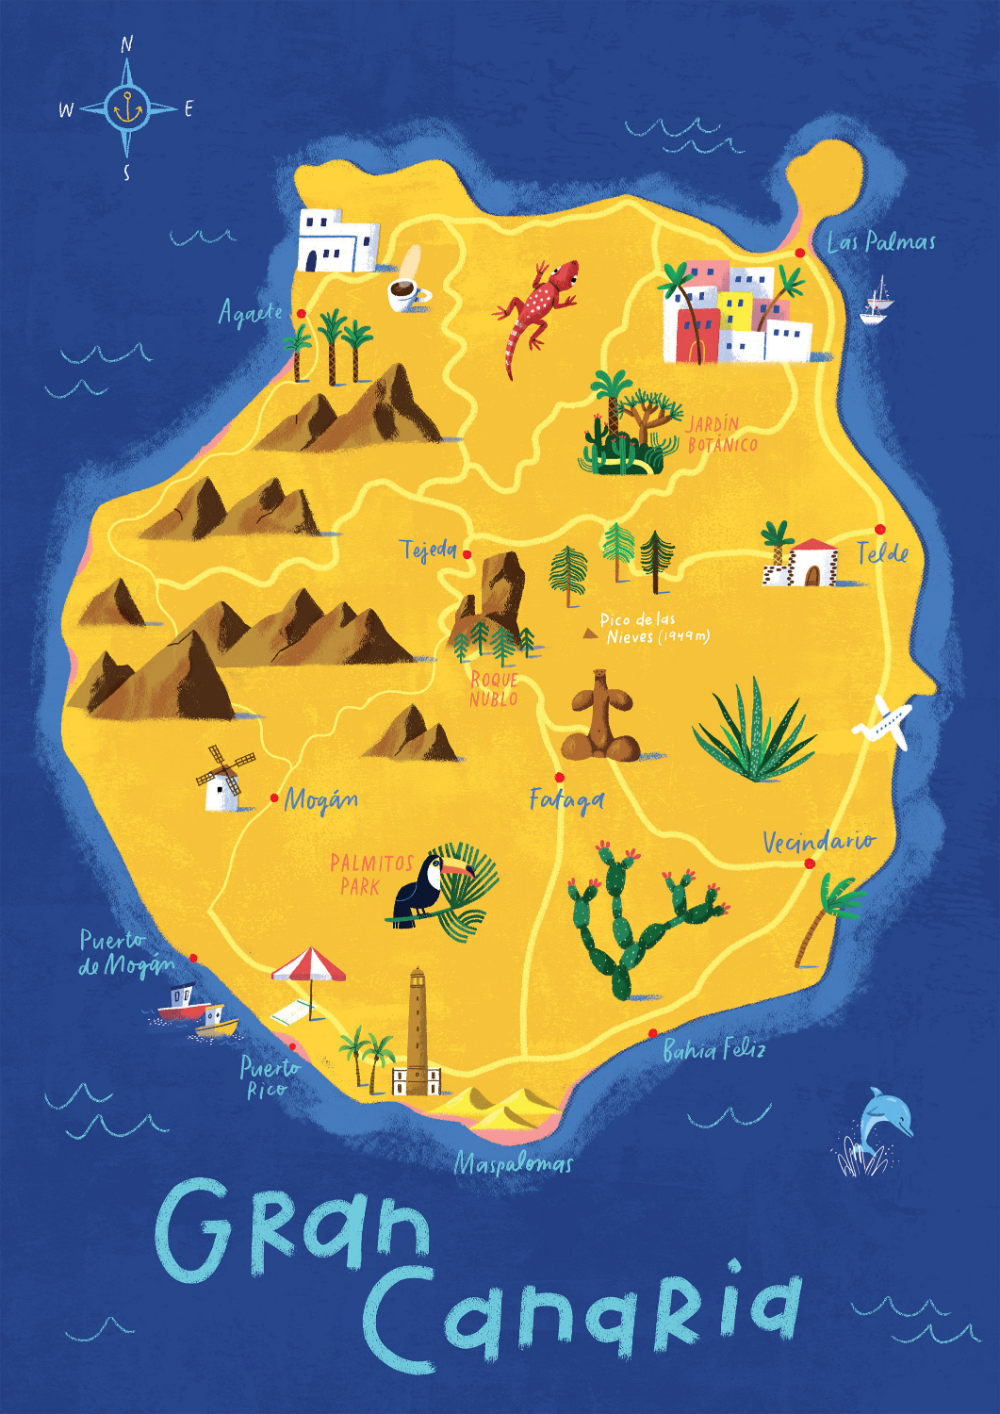 Gran Canaria Map Illustrated Map Las Palmas Canary Islands Etsy In 2020 Illustrated Map Canary Islands Gran Canaria Canary Islands